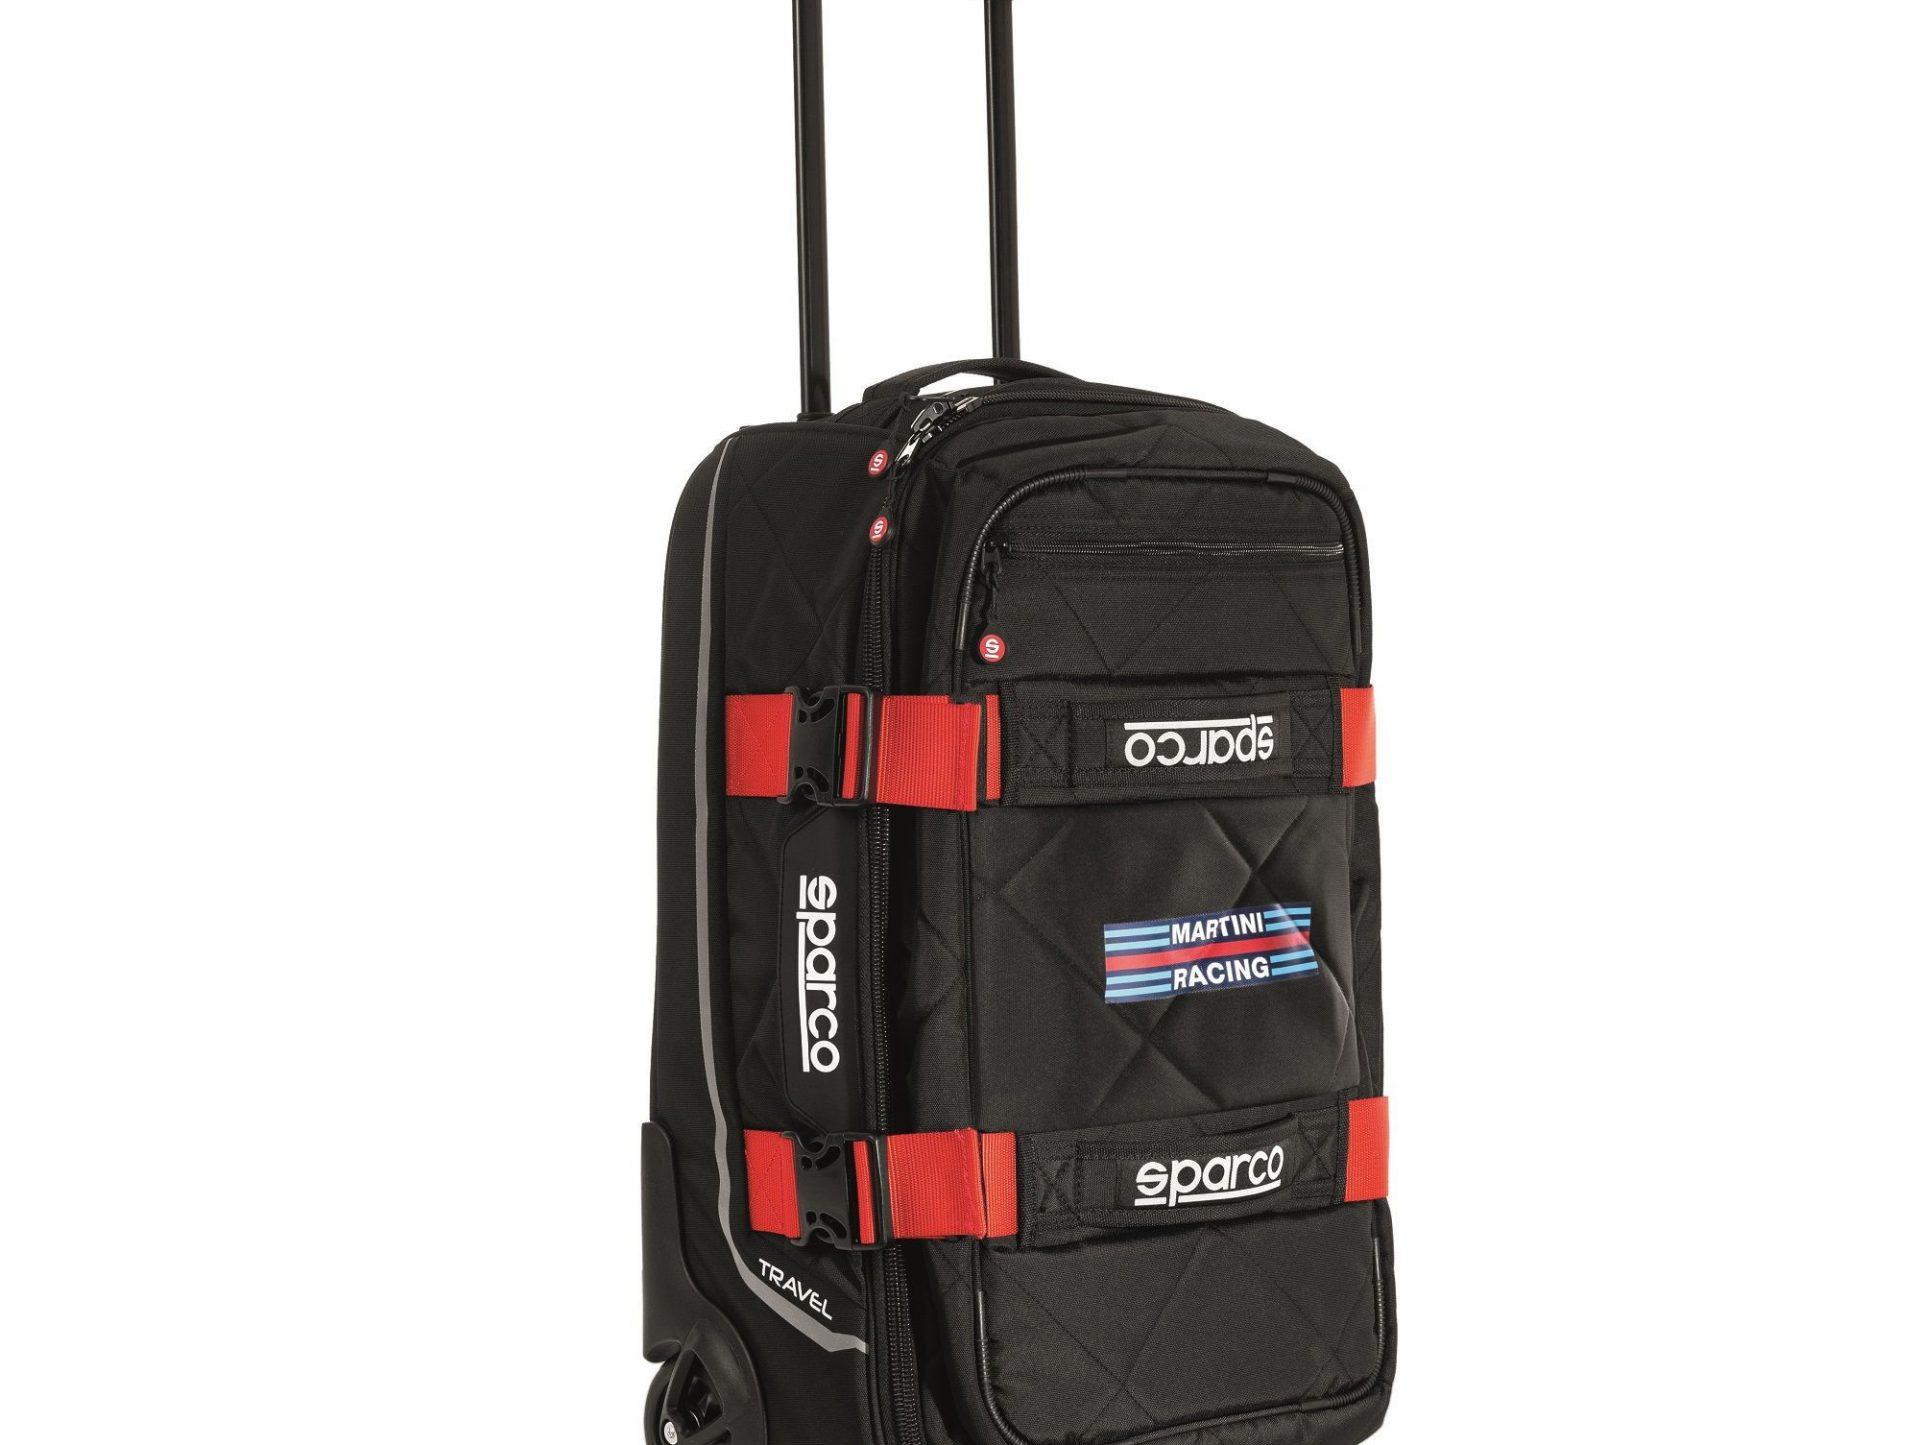 Нов продукт: Sparco Travel Martini Racing, Trolley Bag